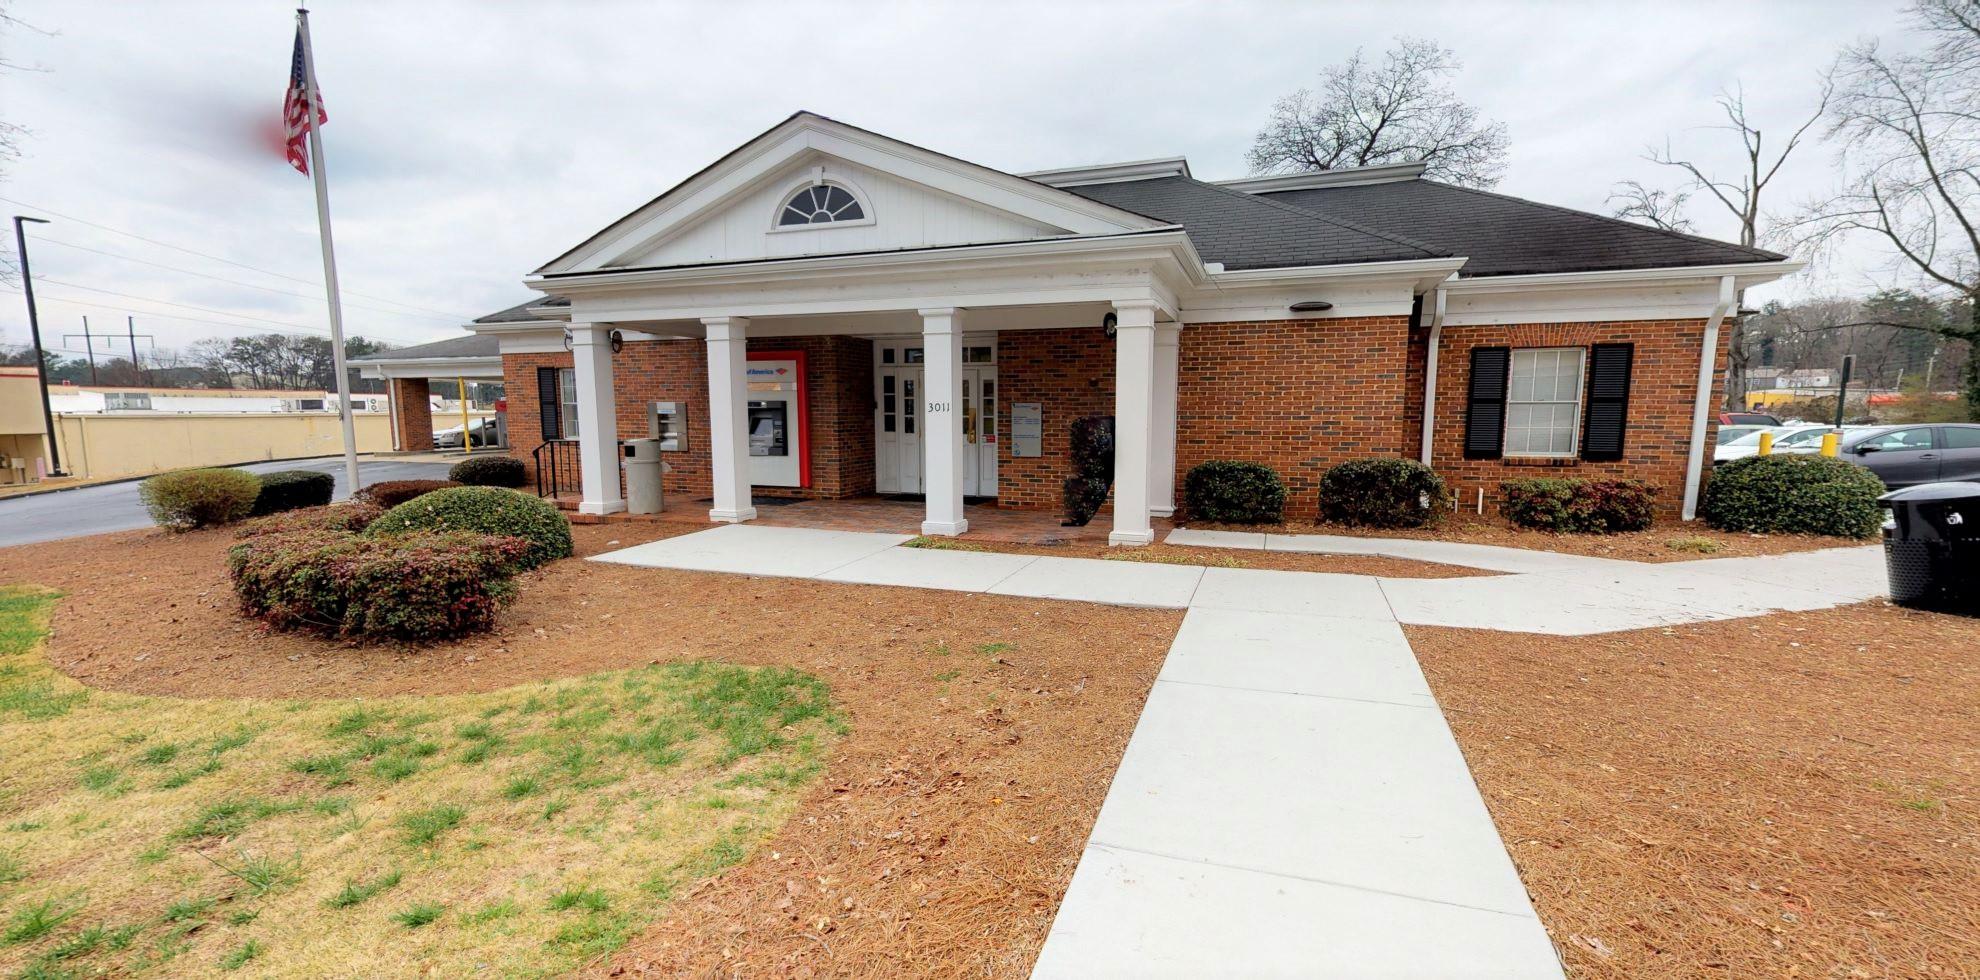 Bank of America financial center with drive-thru ATM and teller | 3011 Headland Dr SW, Atlanta, GA 30311